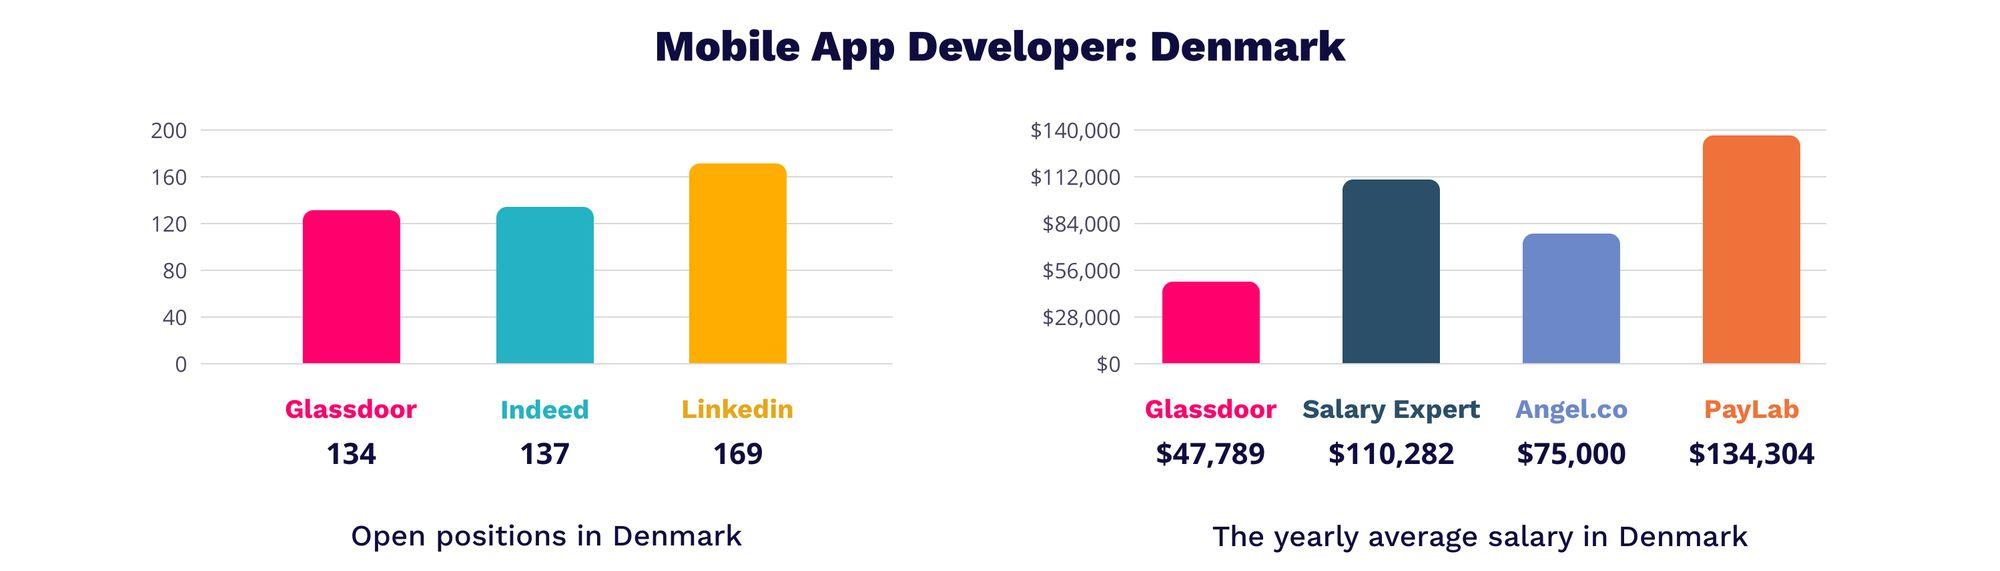 Mobile App Developer Denmark   MagicHire